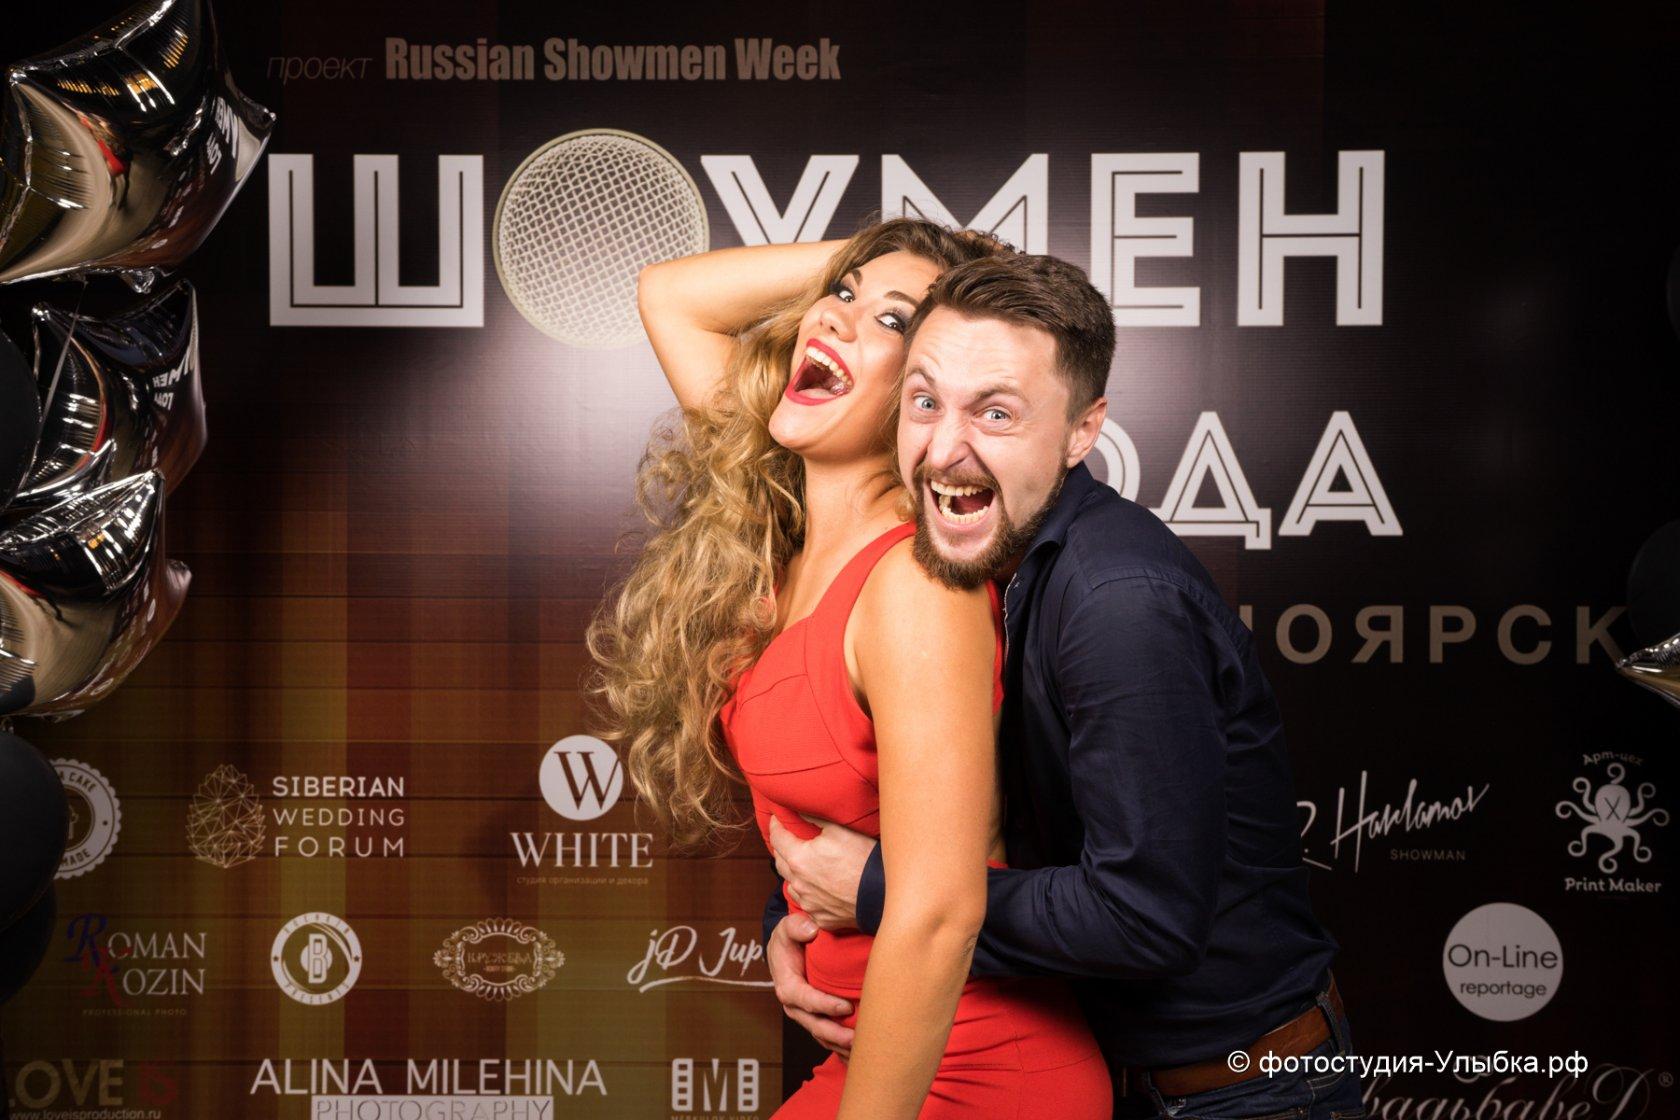 Автотрейд красноярск каталог запчастей с фото магазин предлагает